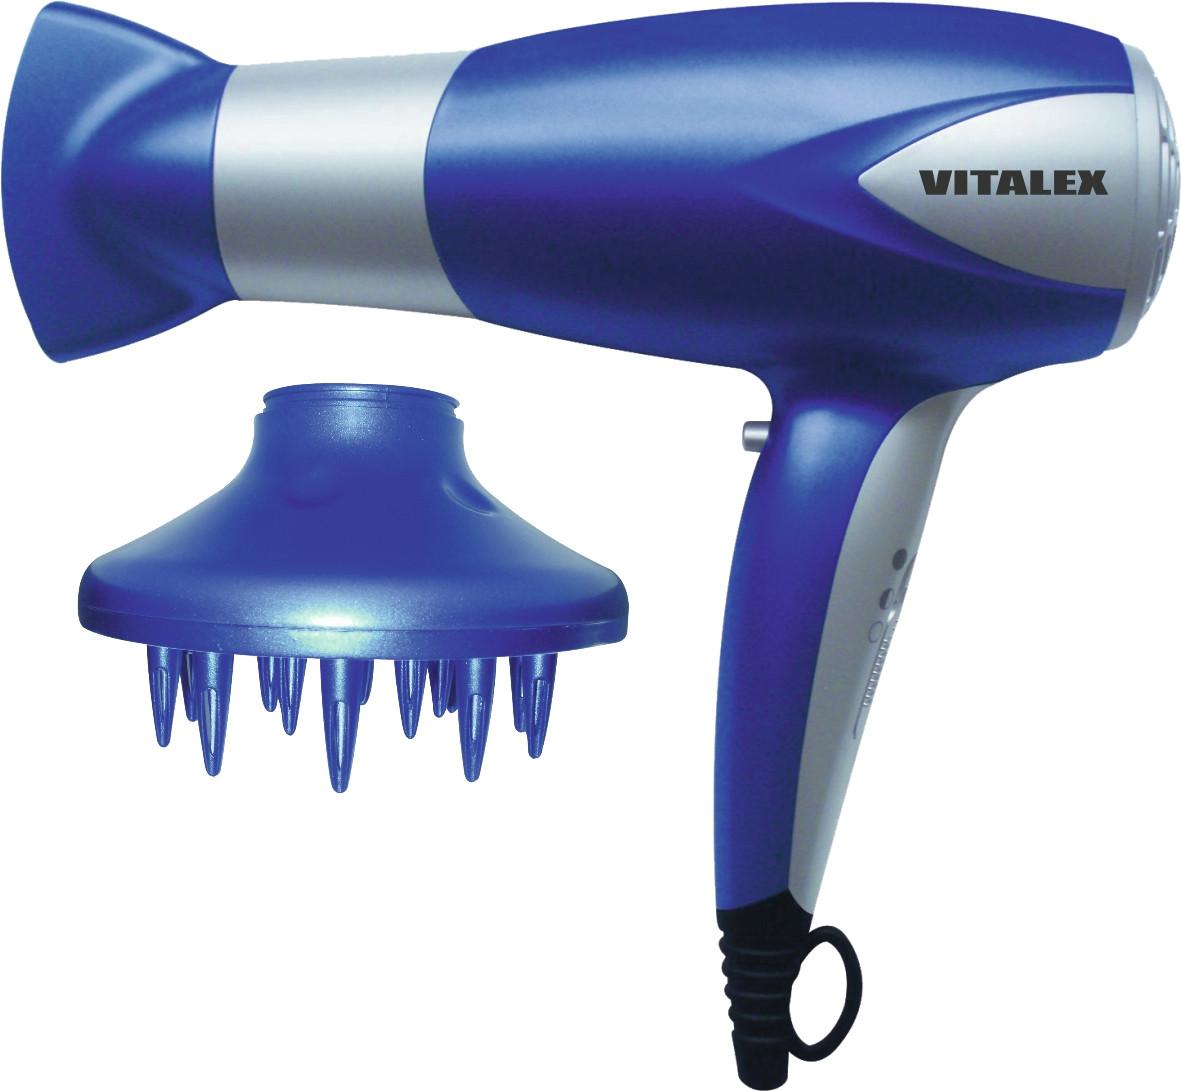 Фен для волос Vitalex VT-4002